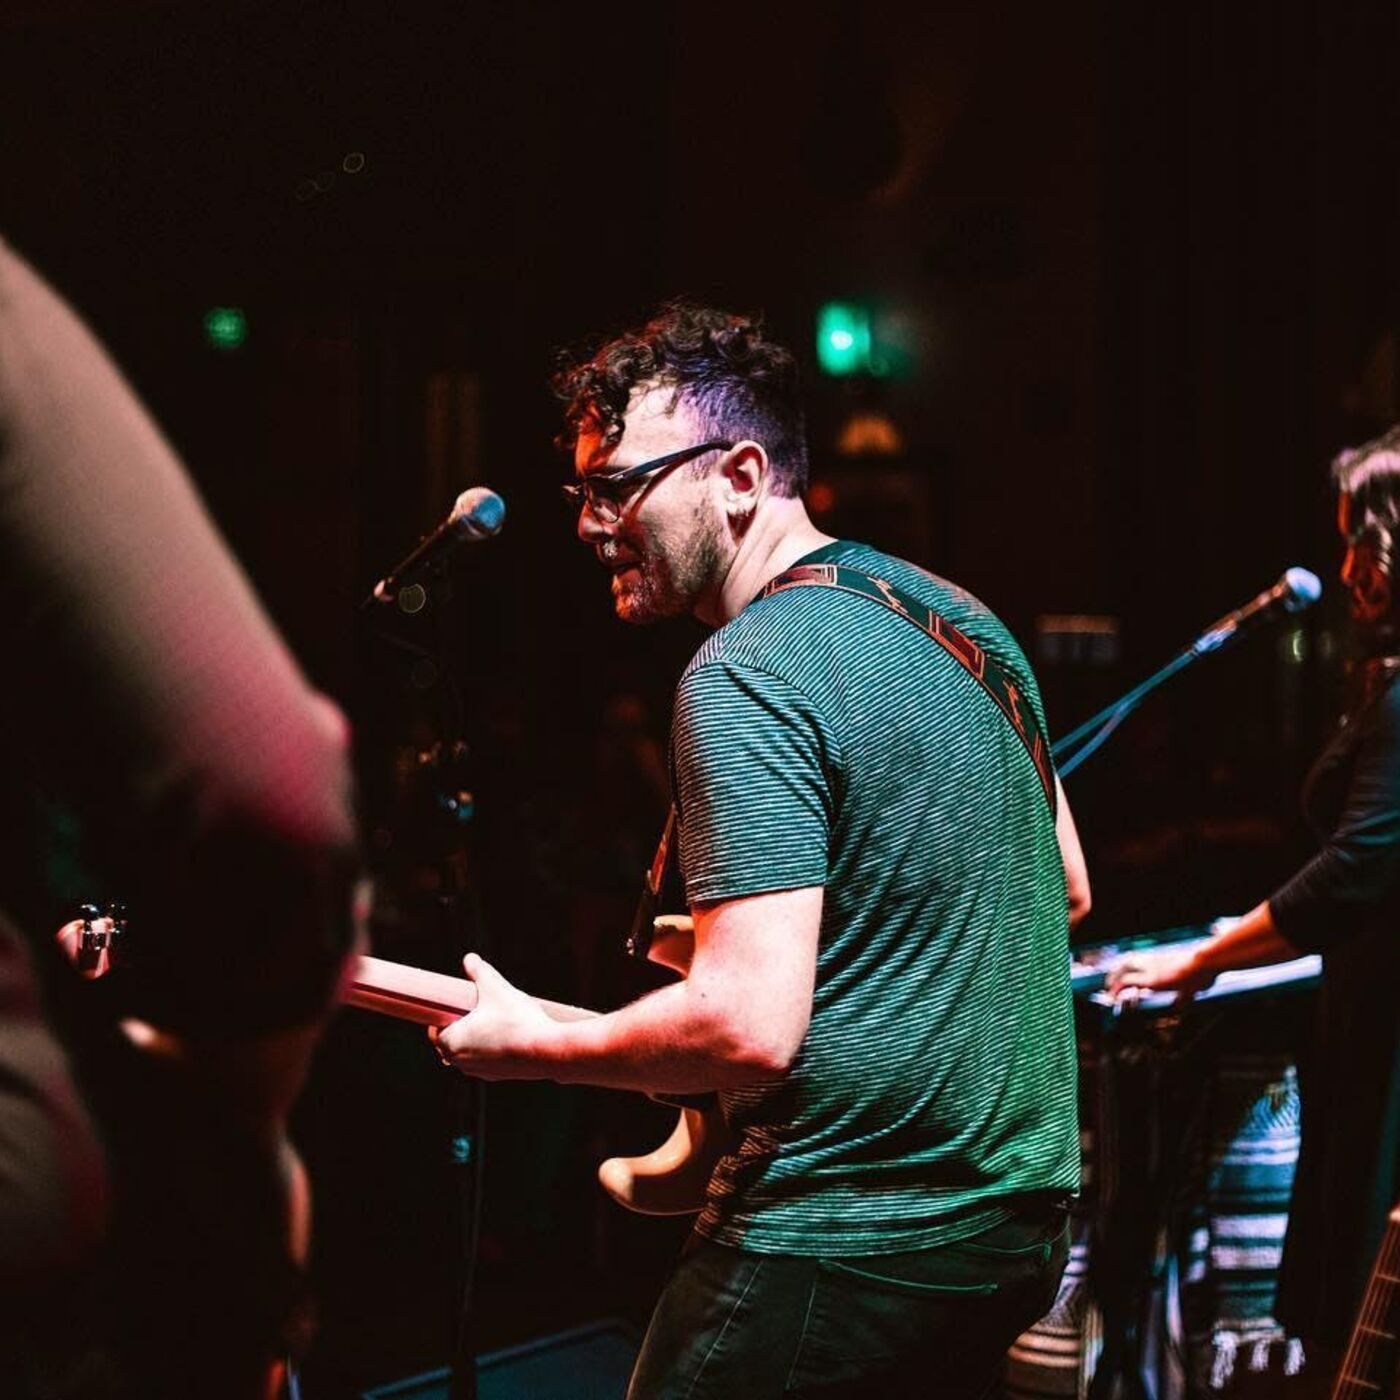 [Bonus] Music Mashtun: Jesse Gimbel performs When the Cold Night Ends!